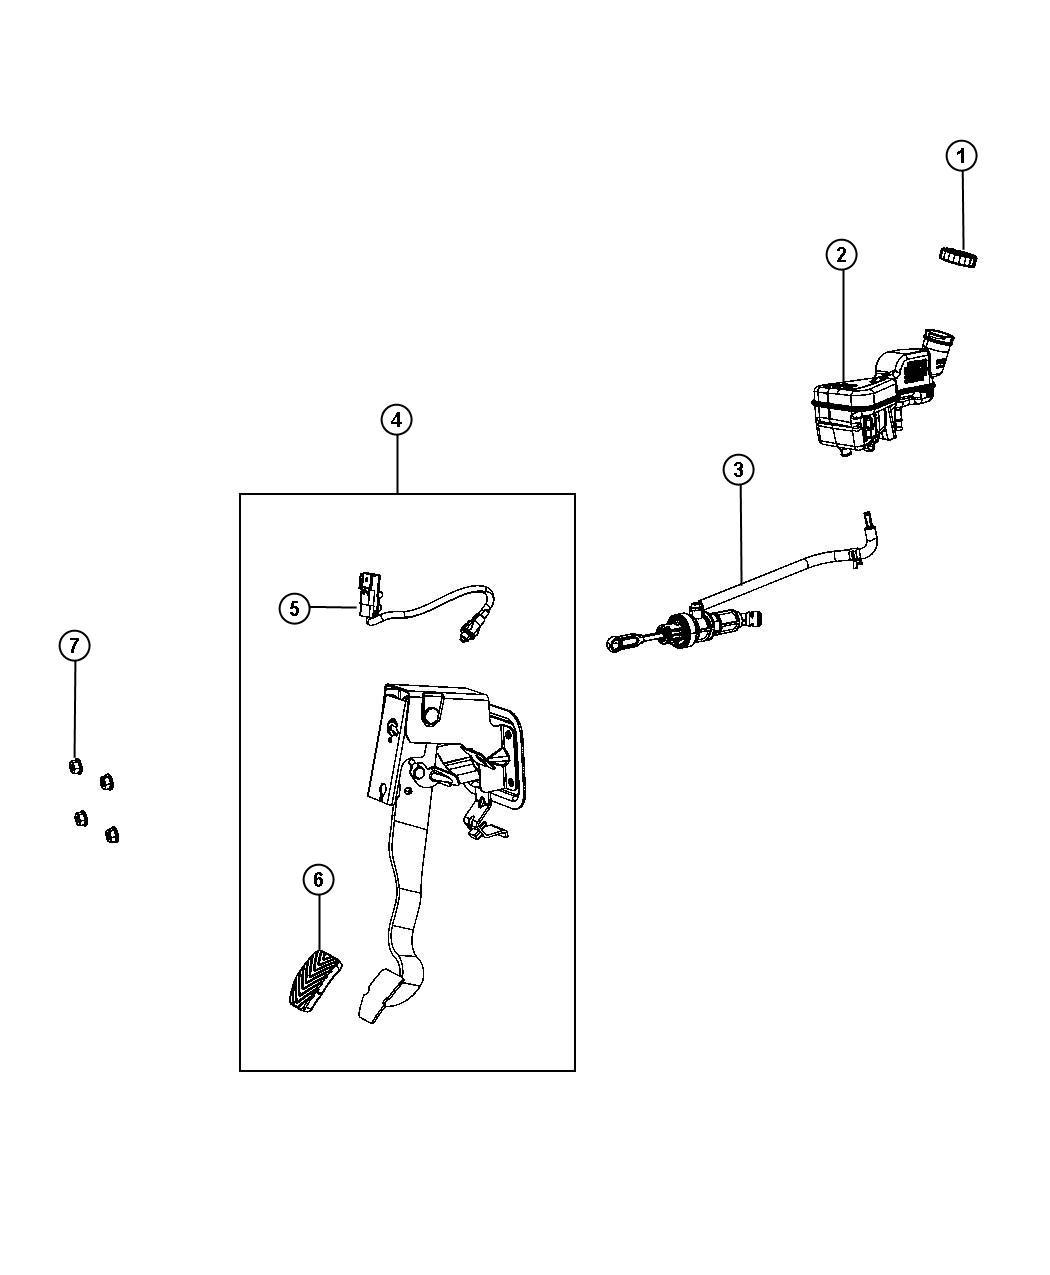 Dodge Caliber Switch. Clutch starter interlock. [5-speed